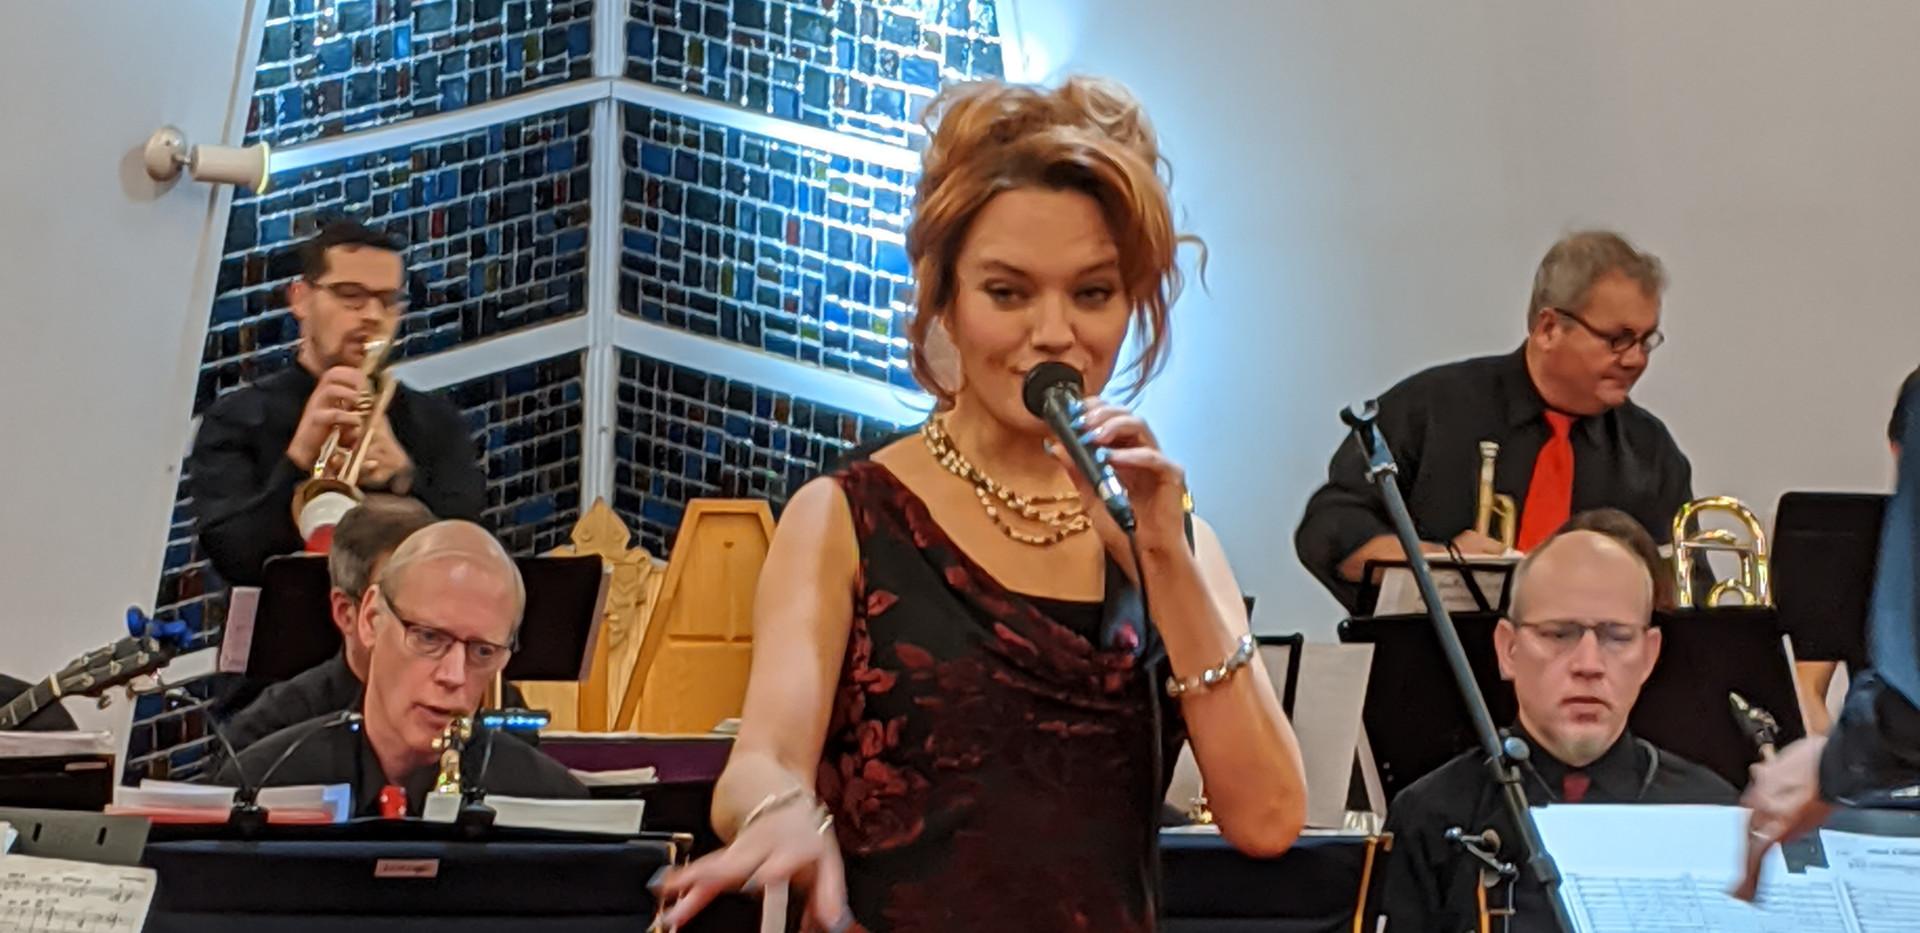 Katherine singing.jpg